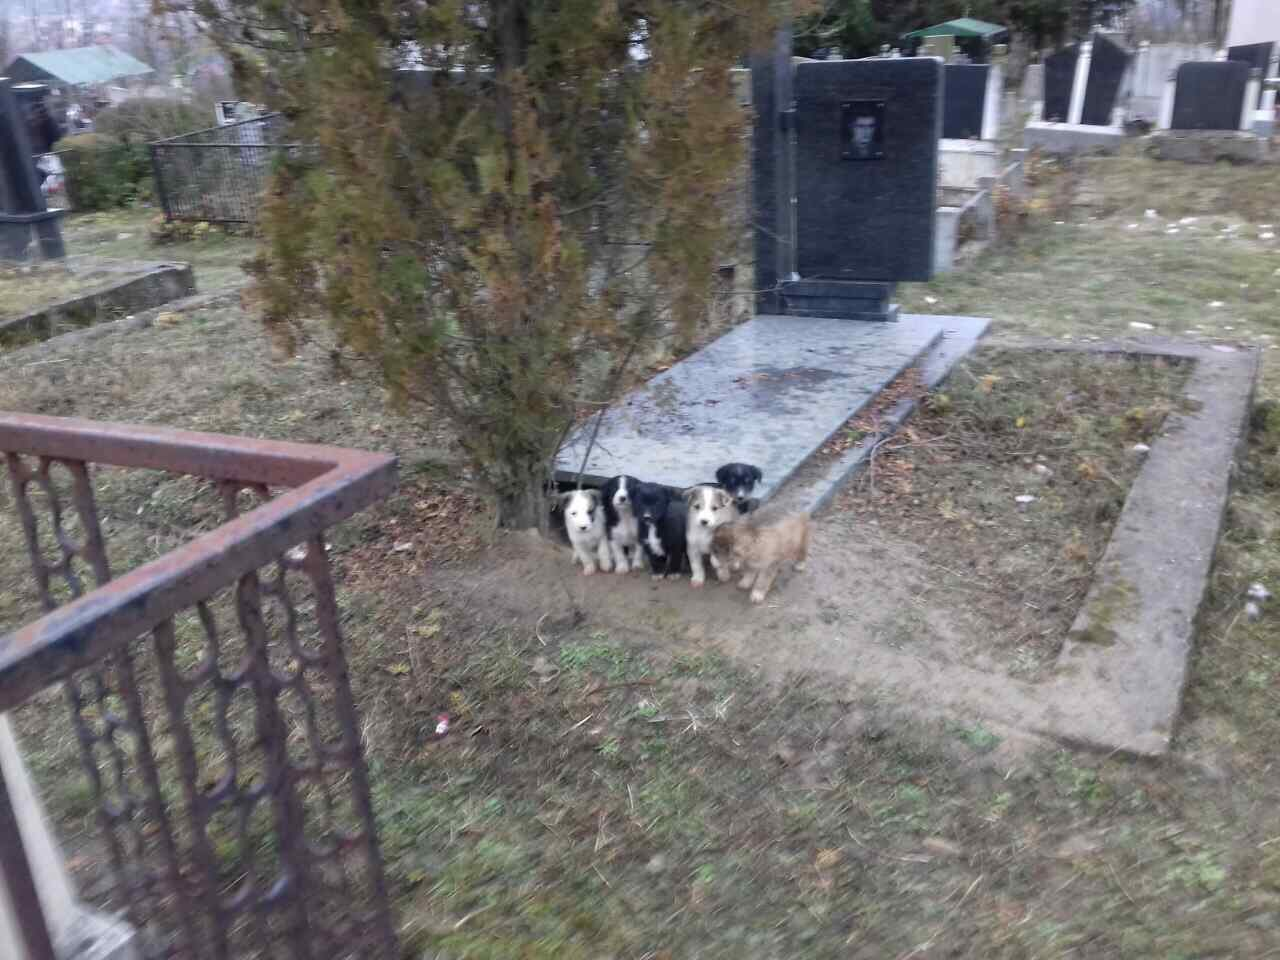 FOTO PRIČA: Spas od zime našli ispod groba! (FOTO)